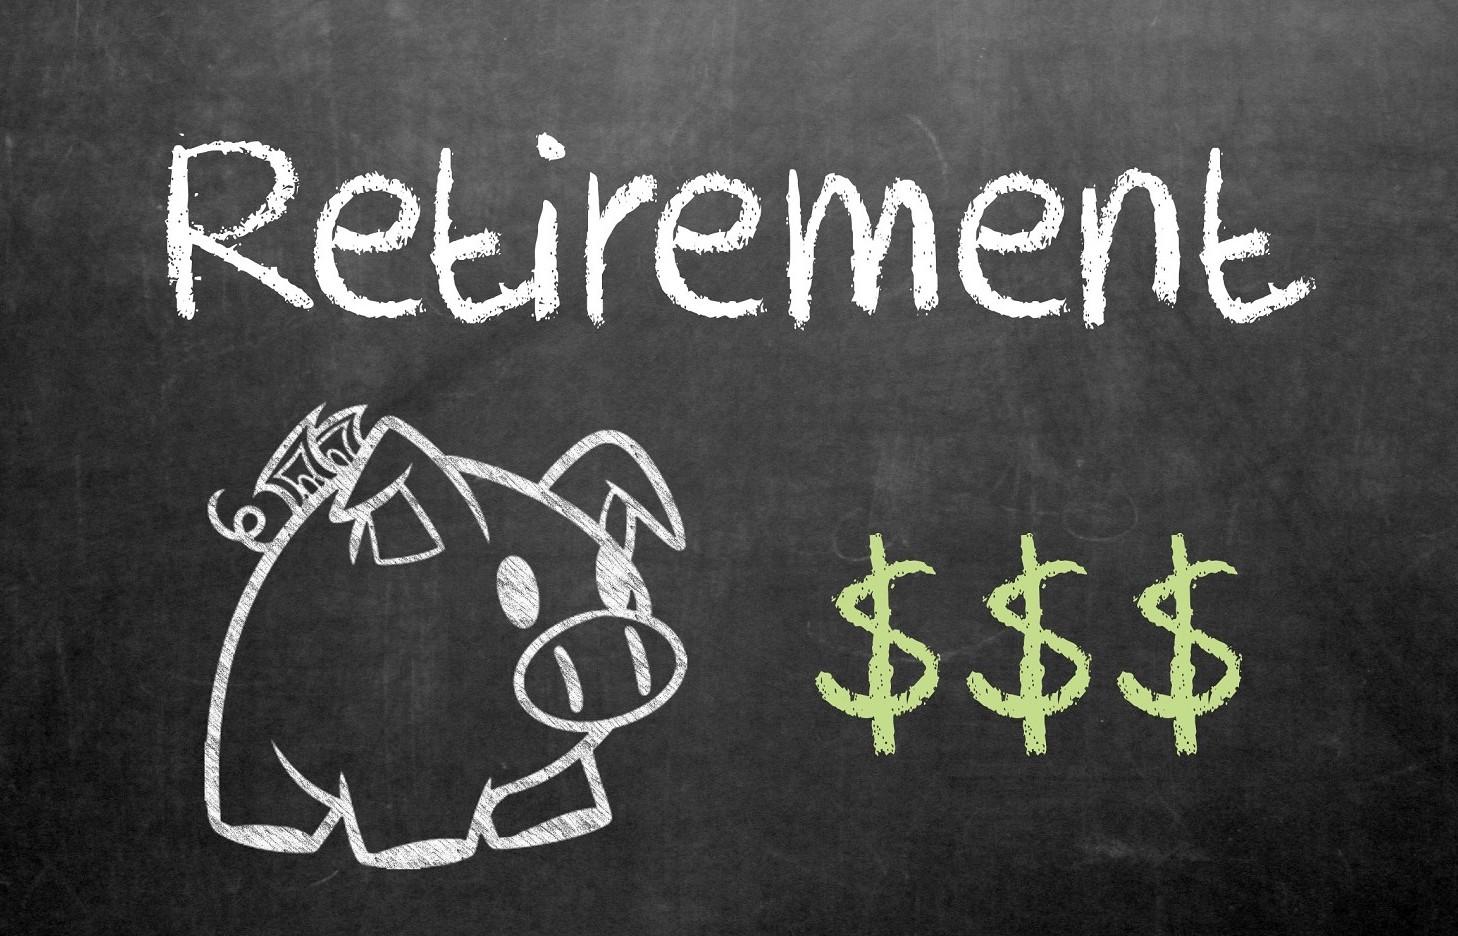 Pensioni ultime notizie Job Acts falllim